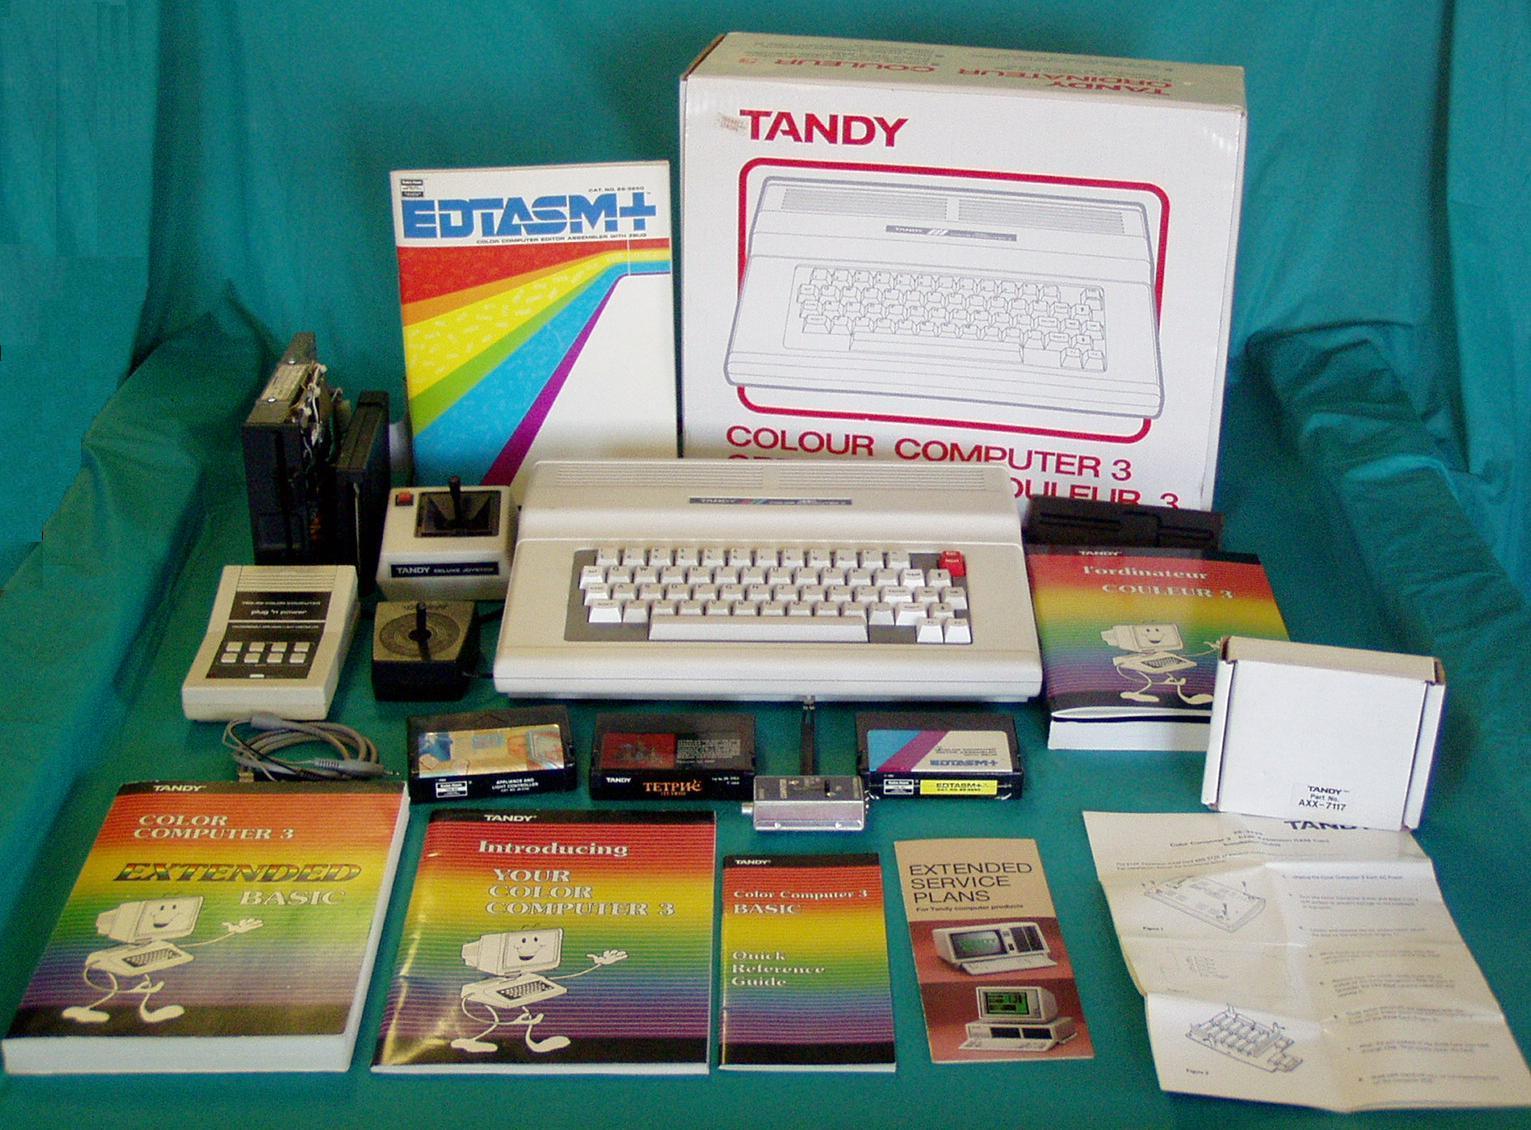 daves old computers radioshack tandy color computer dragon